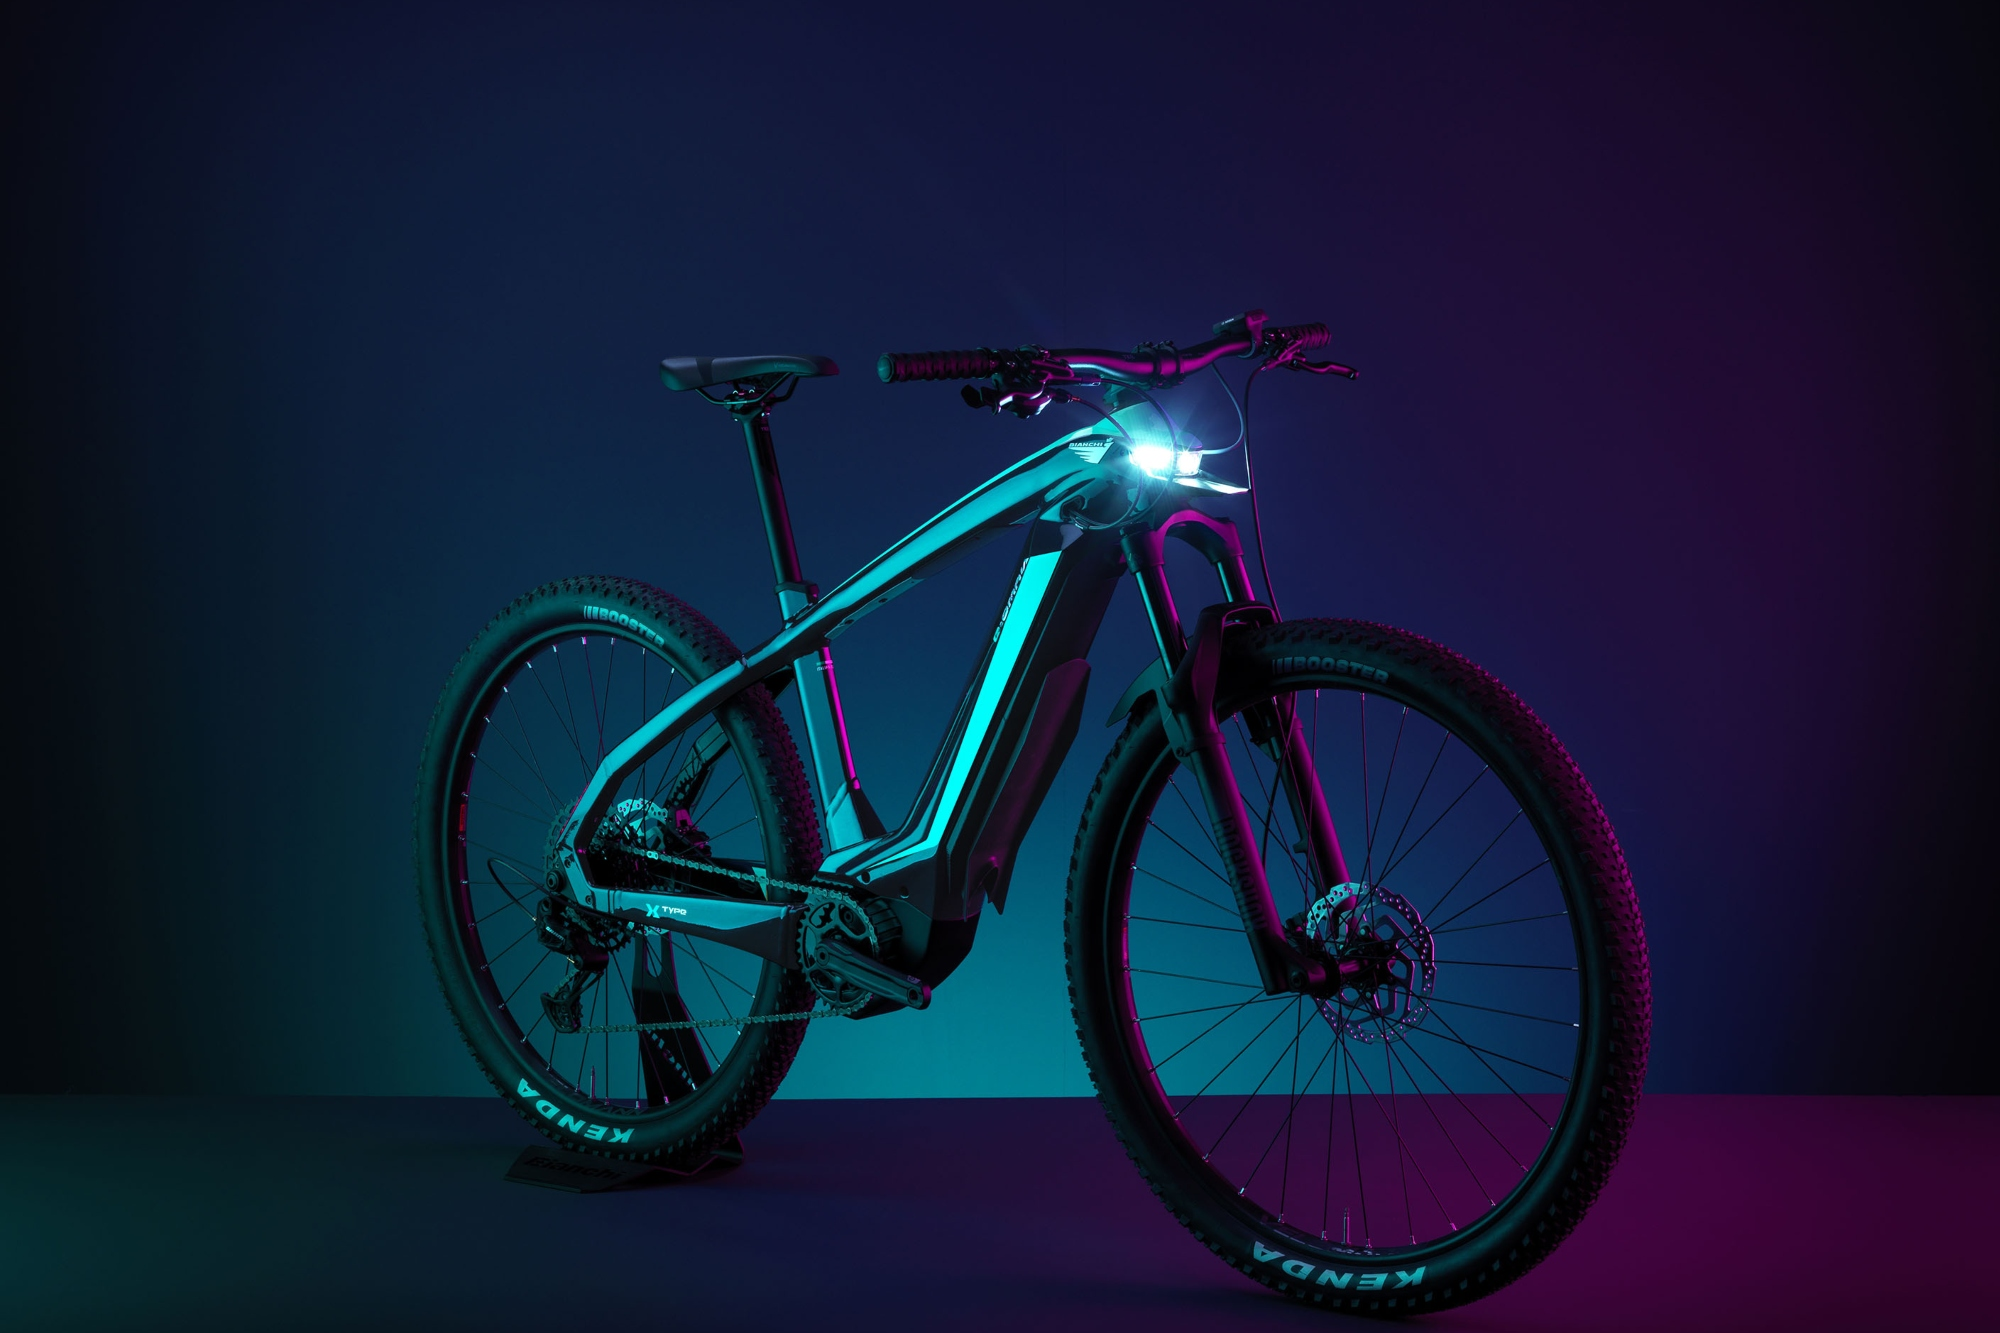 Bianchi adds ABS to its e-Omnia e-bike range